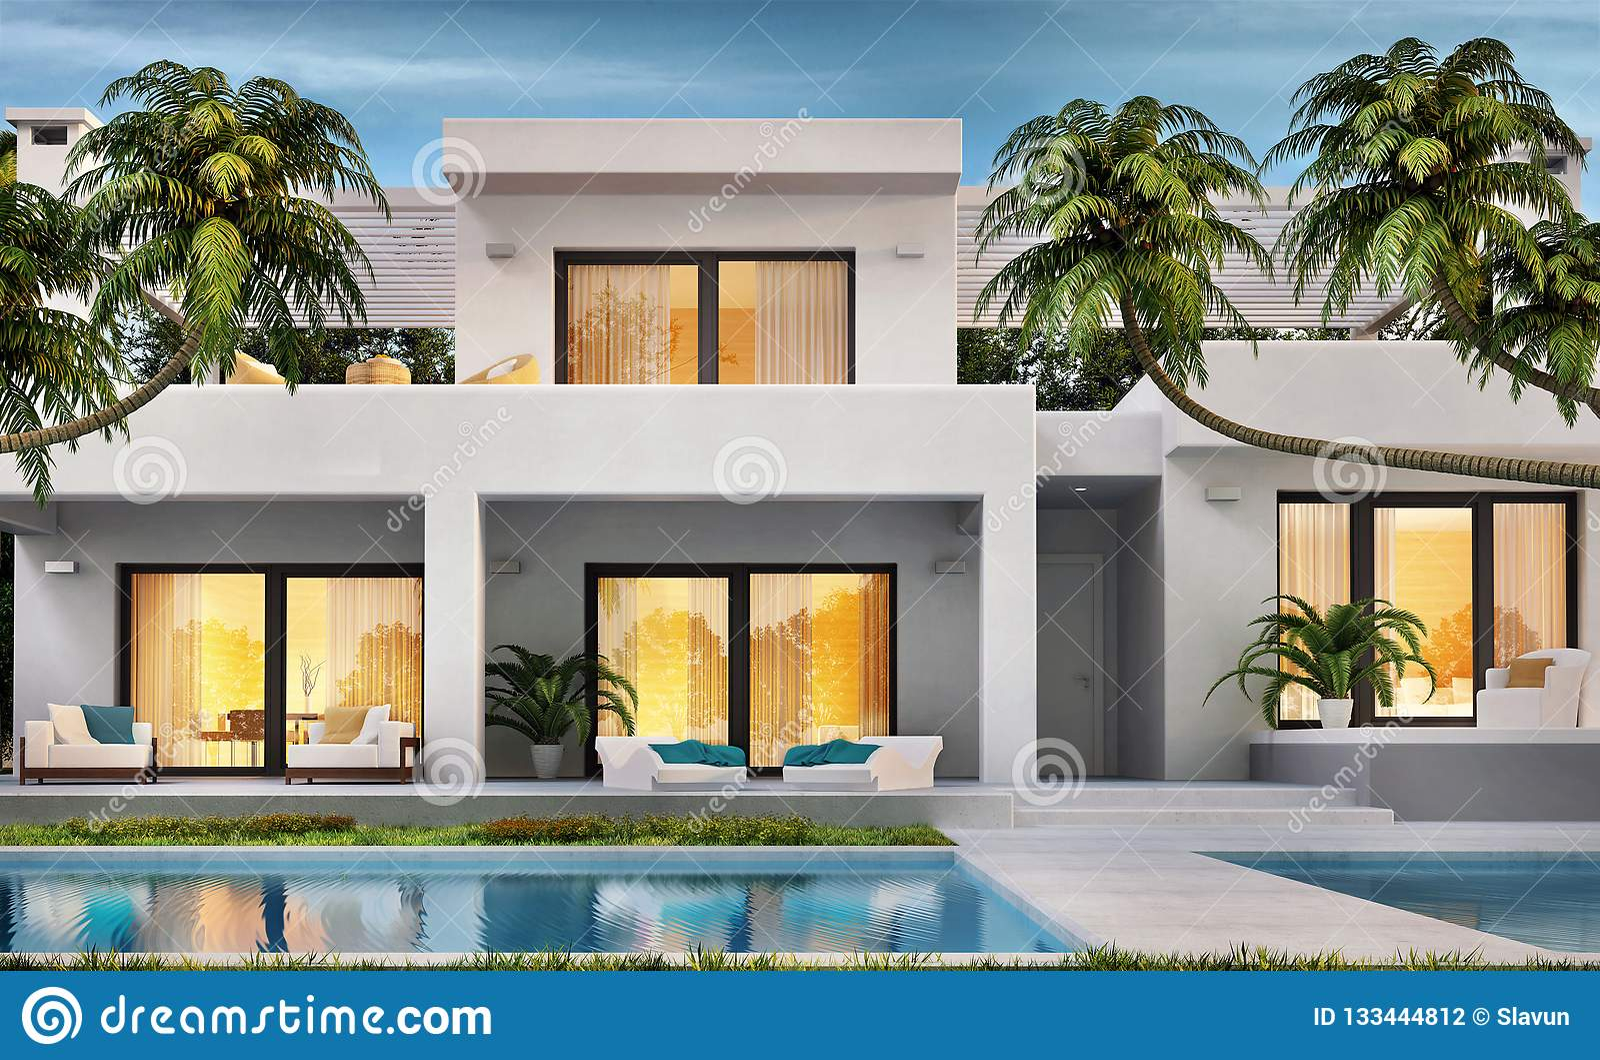 Maison Blanche Moderne Avec La Piscine Photo stock - Image ...